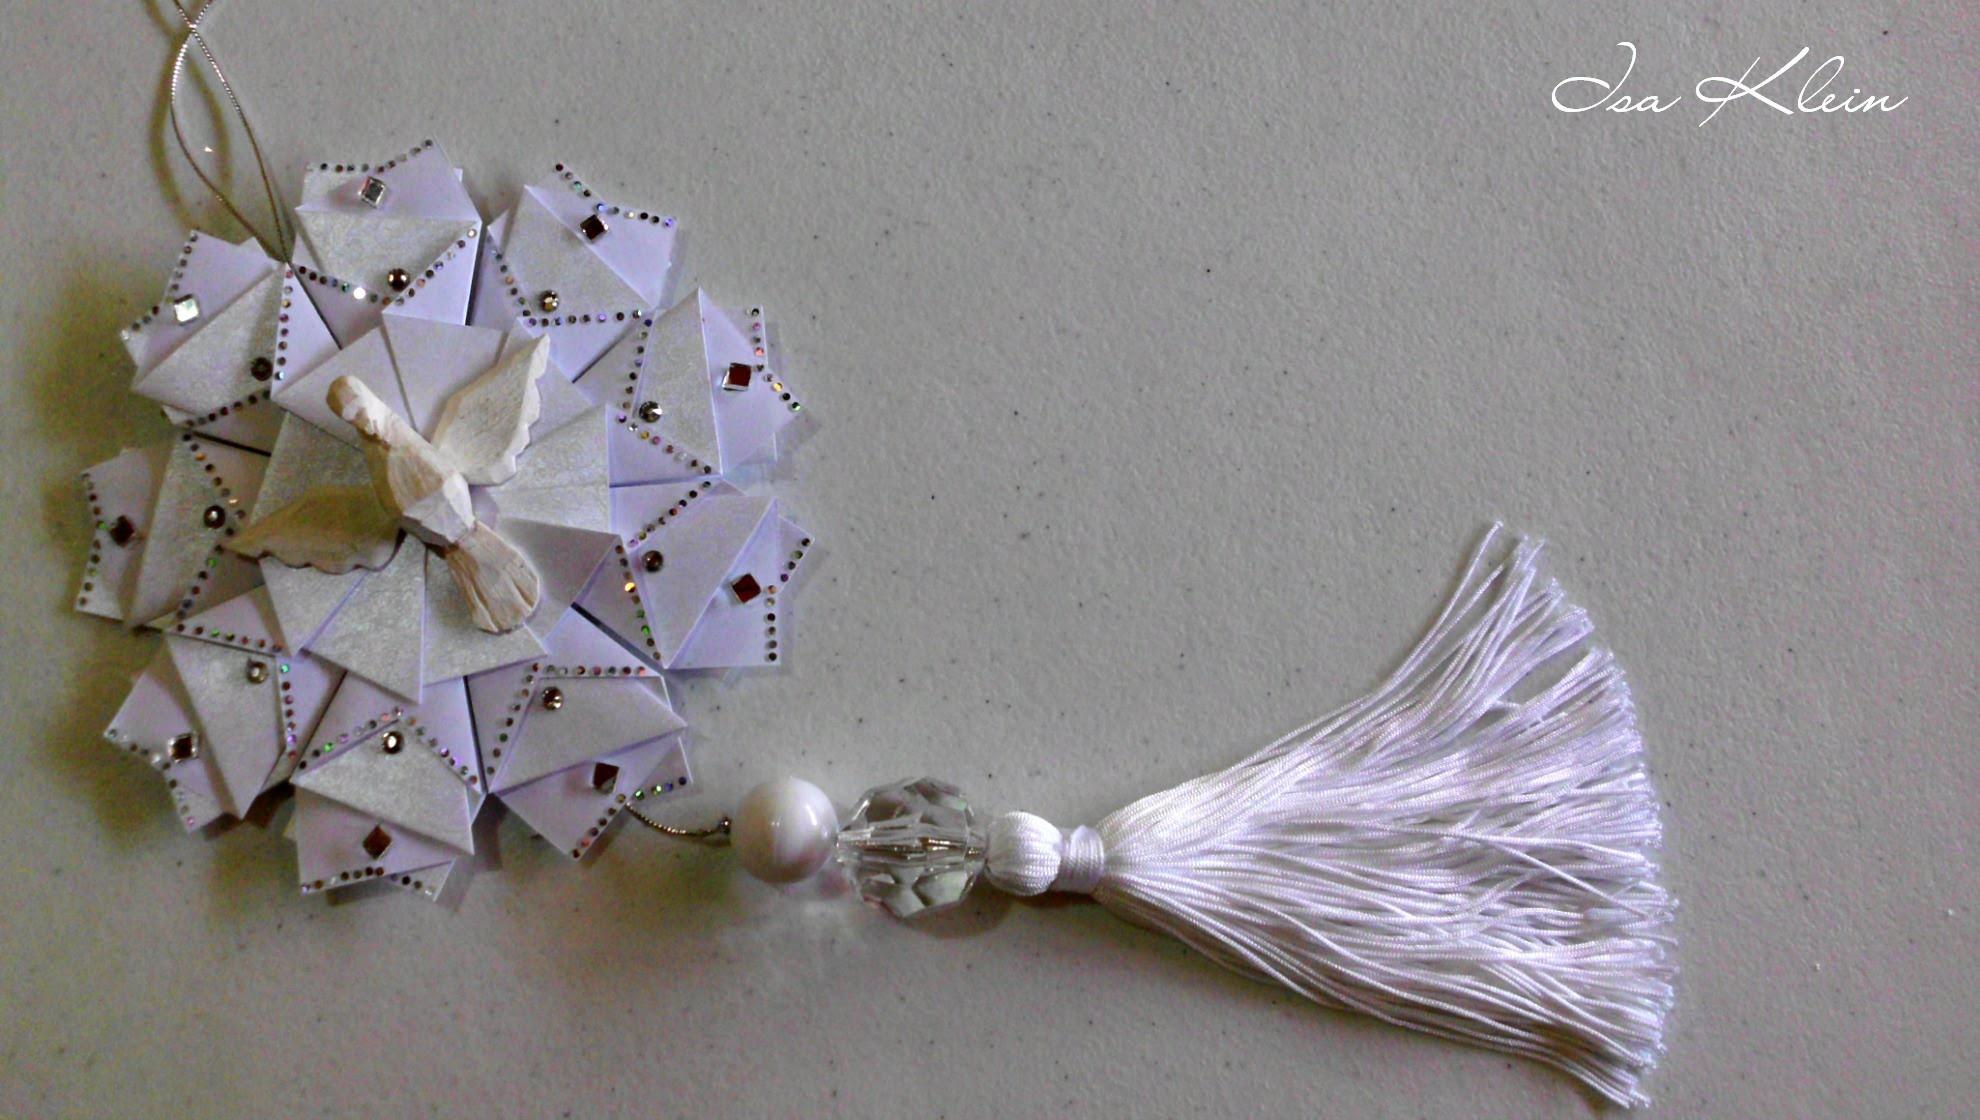 Tassel (franja) com nó invisível - Tassel with invisible knot